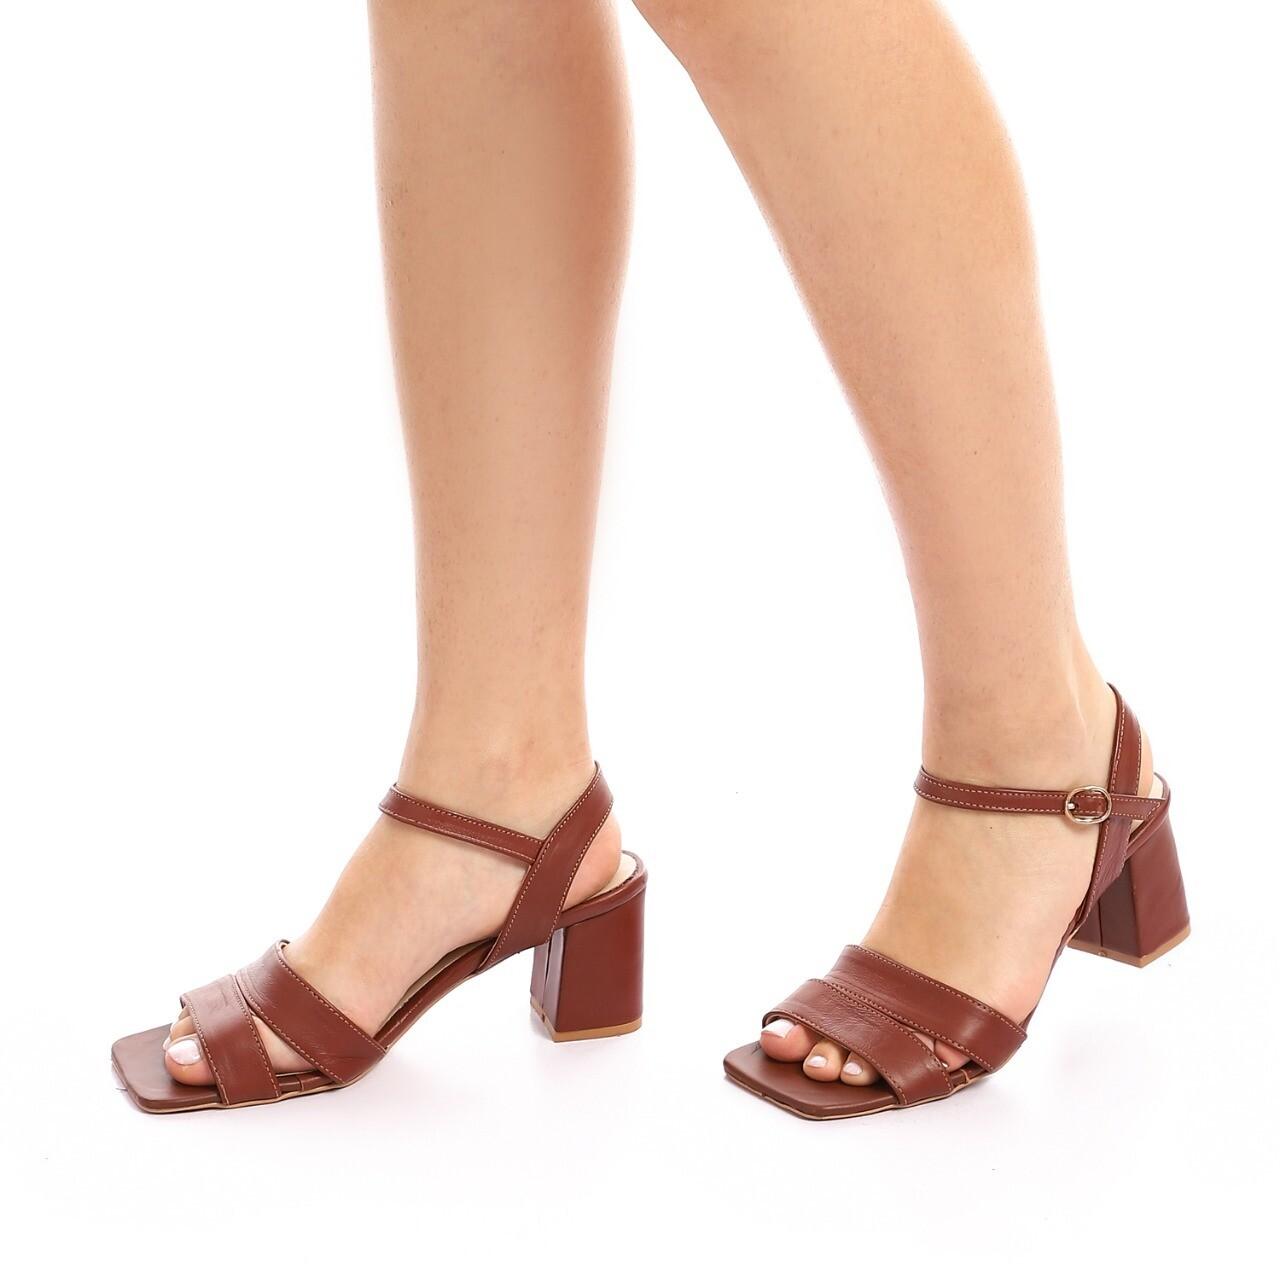 3804 Sandal - Havan جلد طبيعى